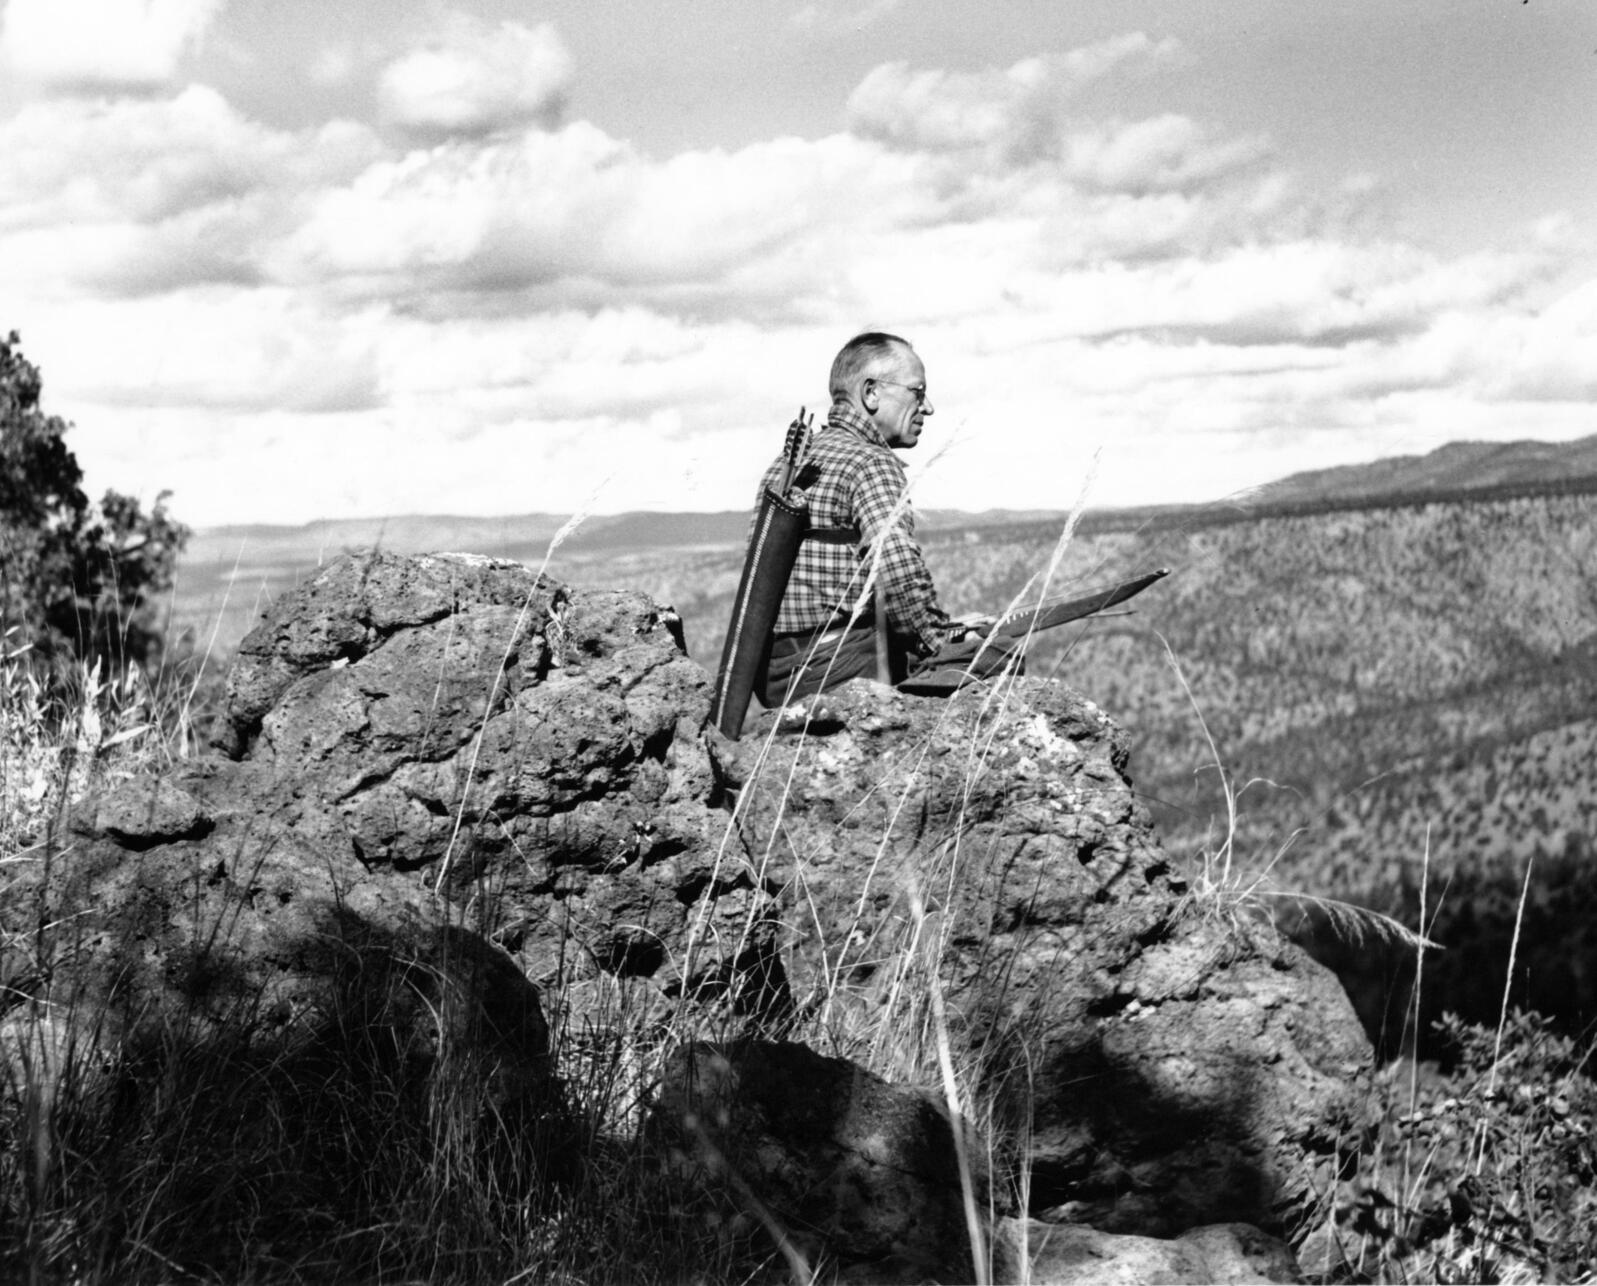 Aldo Leopold sitting on rimrock with quiver and bow at Rio Gavilan in Mexico. Starker Leopold/Aldo Leopold Foundation